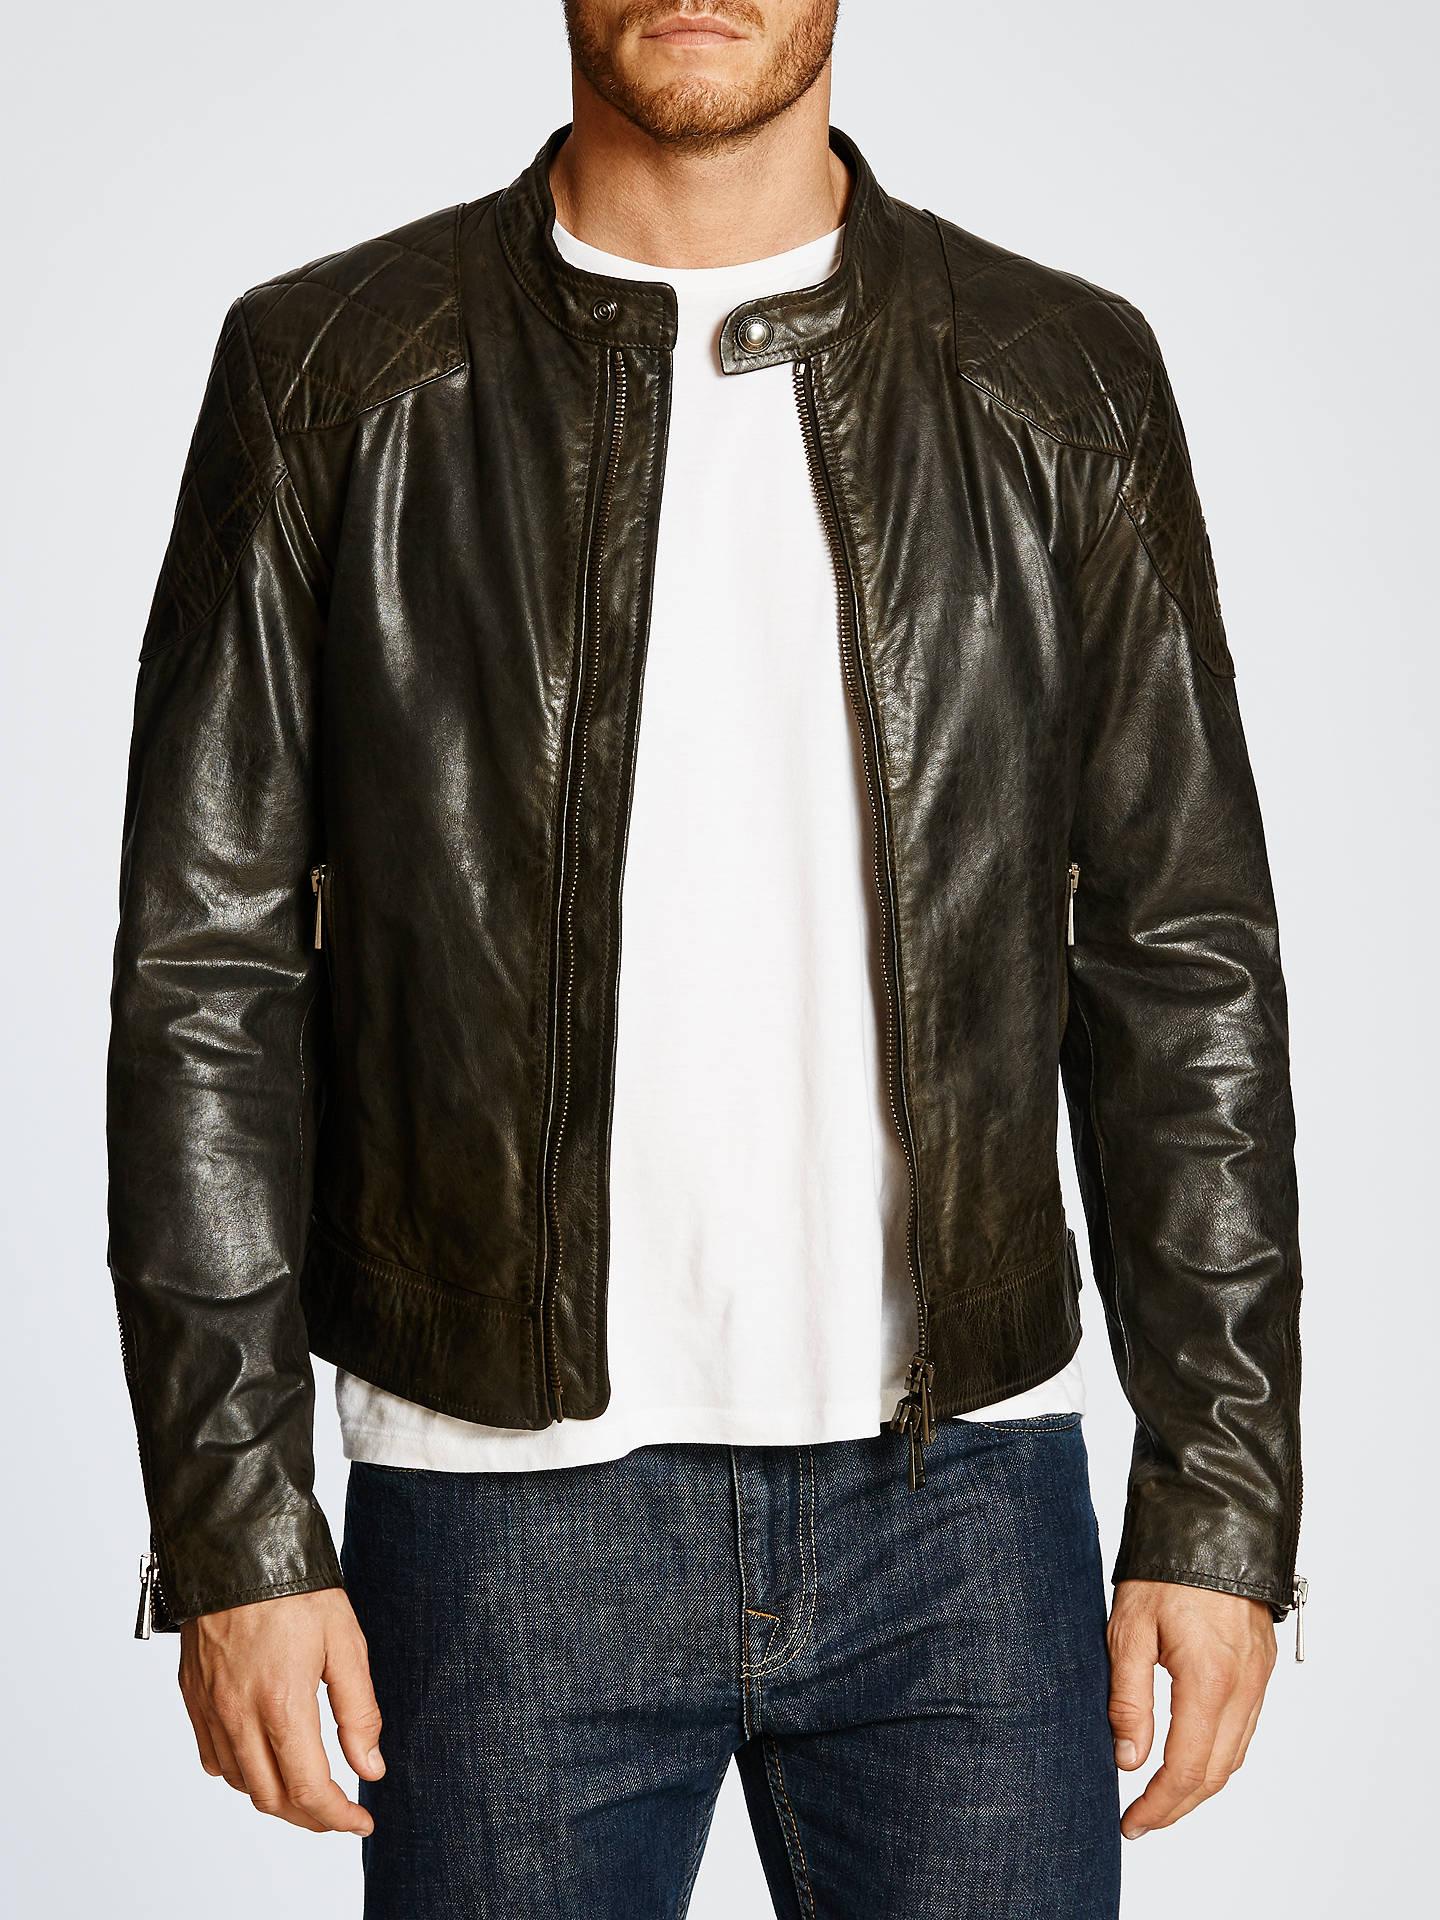 7ec88b0fa Belstaff Outlaw Leather Jacket, Black at John Lewis & Partners